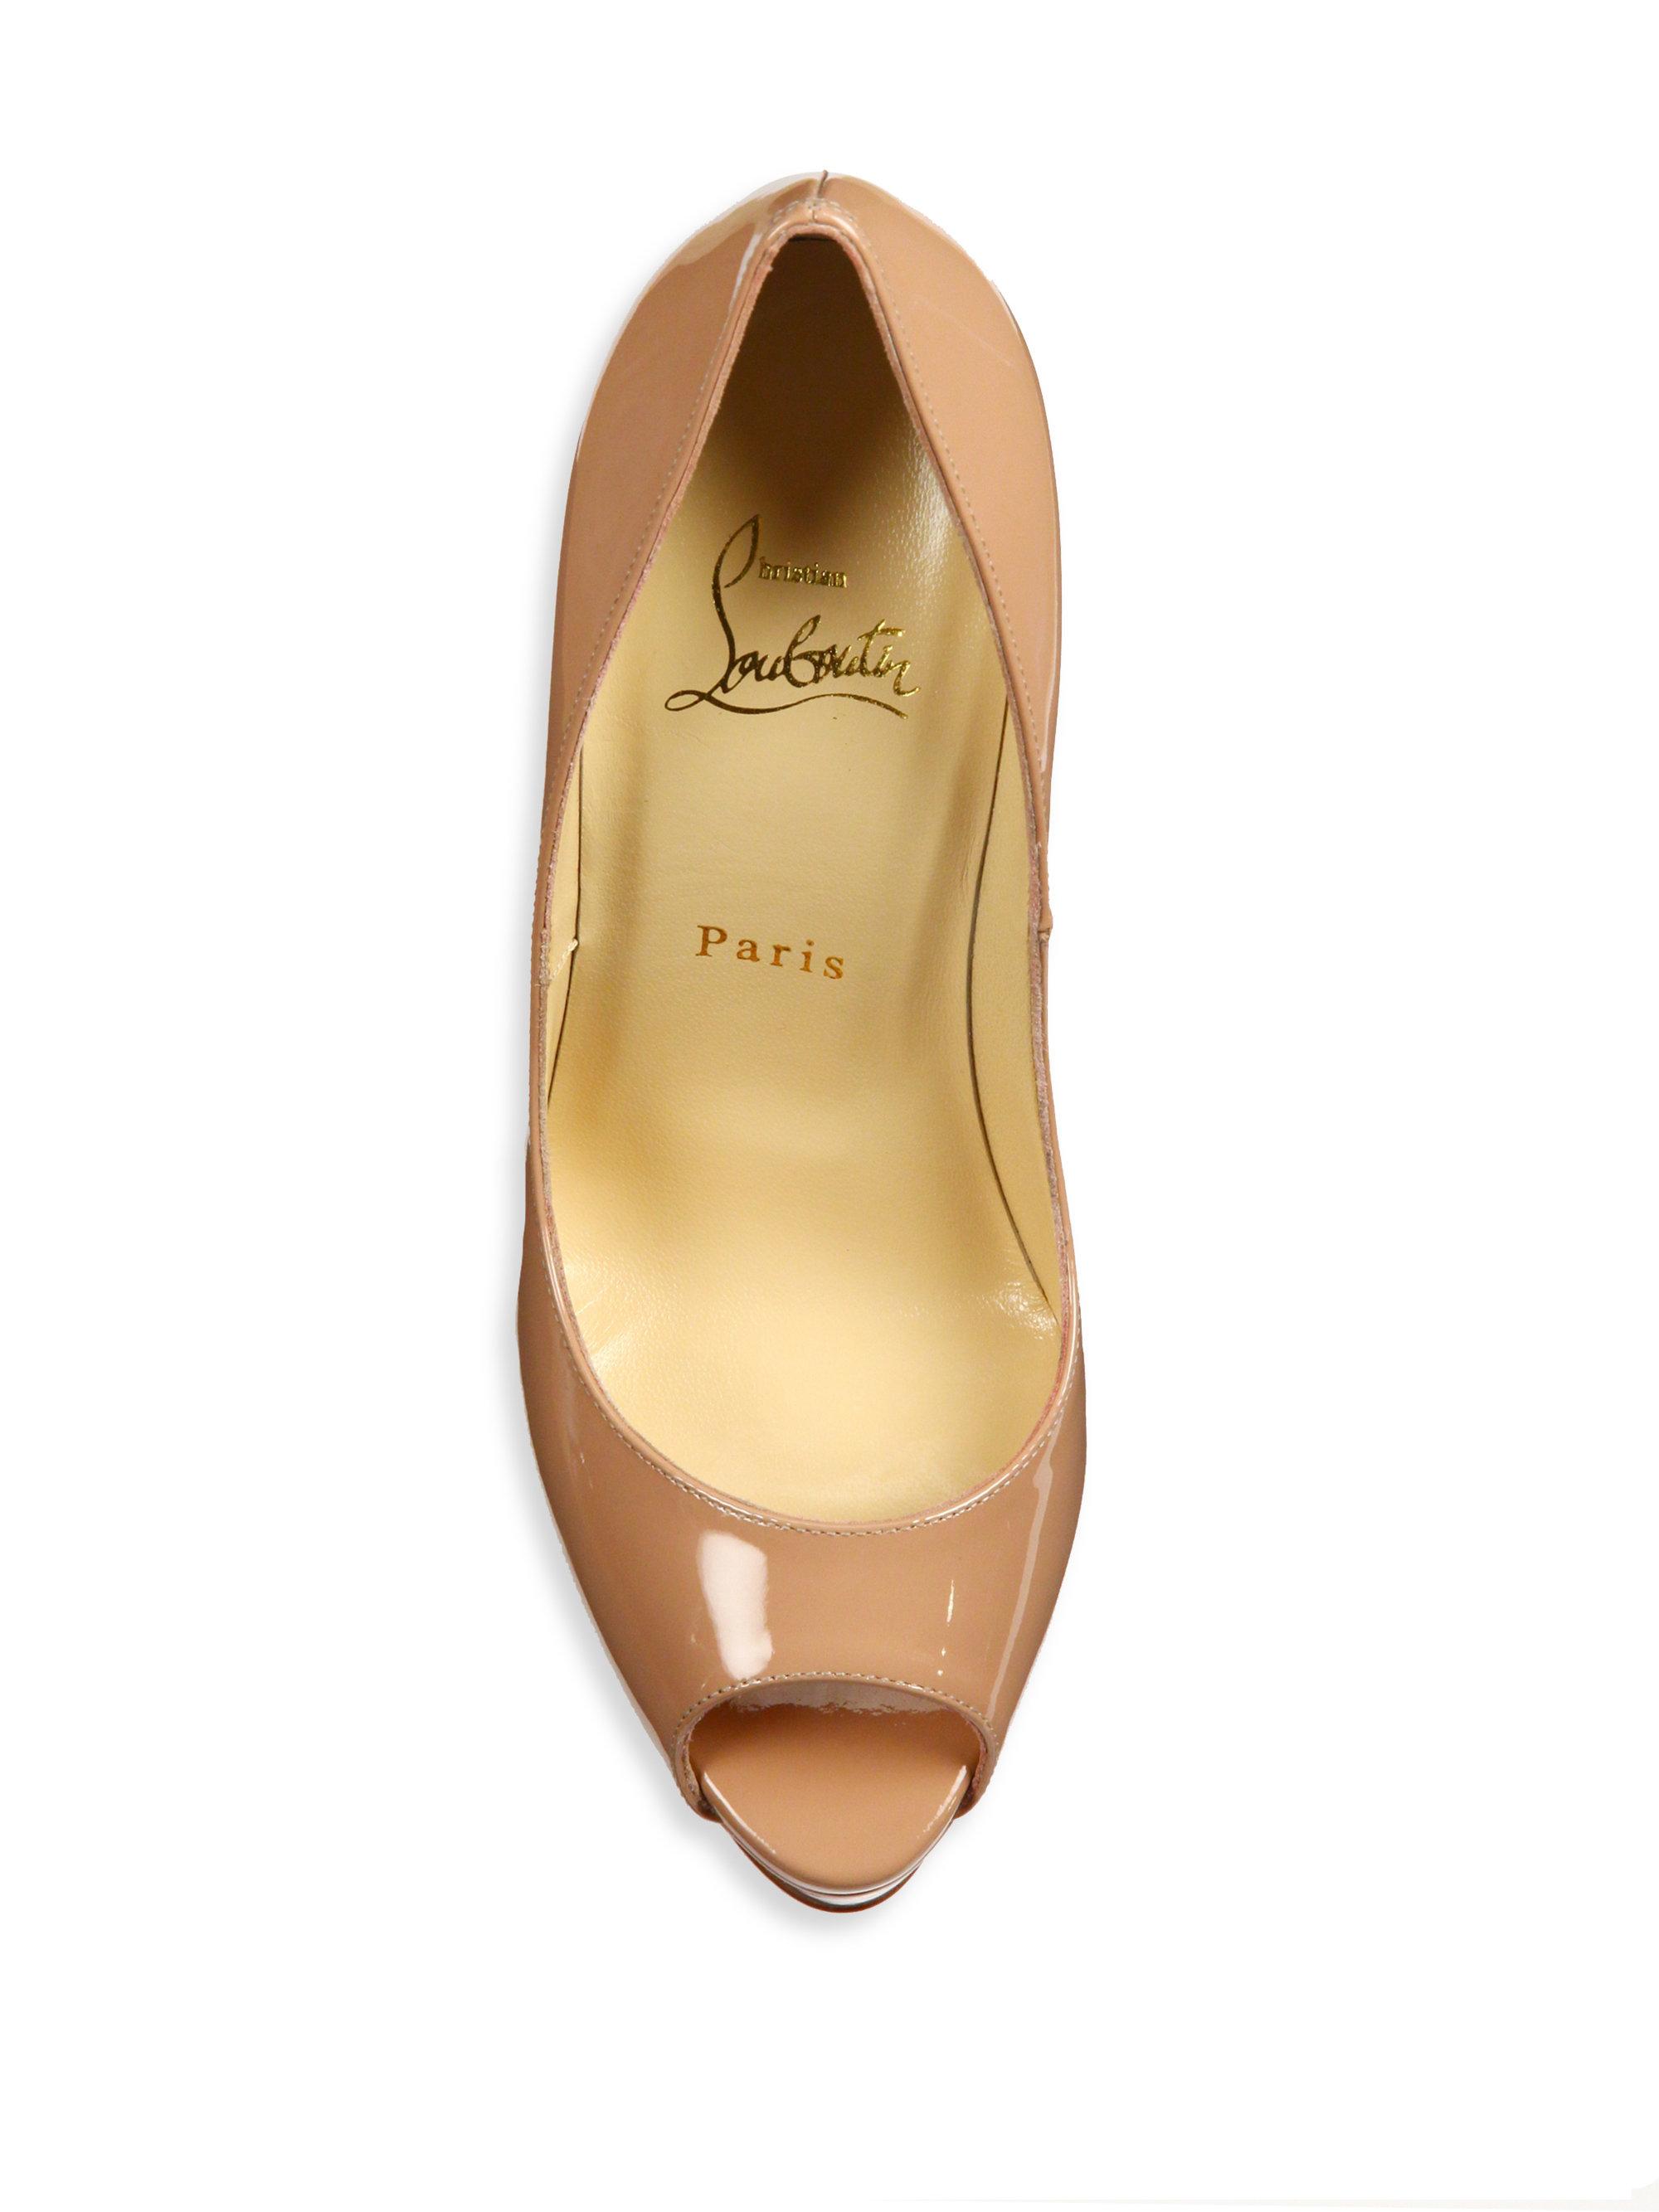 us replica cl shoes - christian louboutin women's pyrabubble platform sandals, christian ...